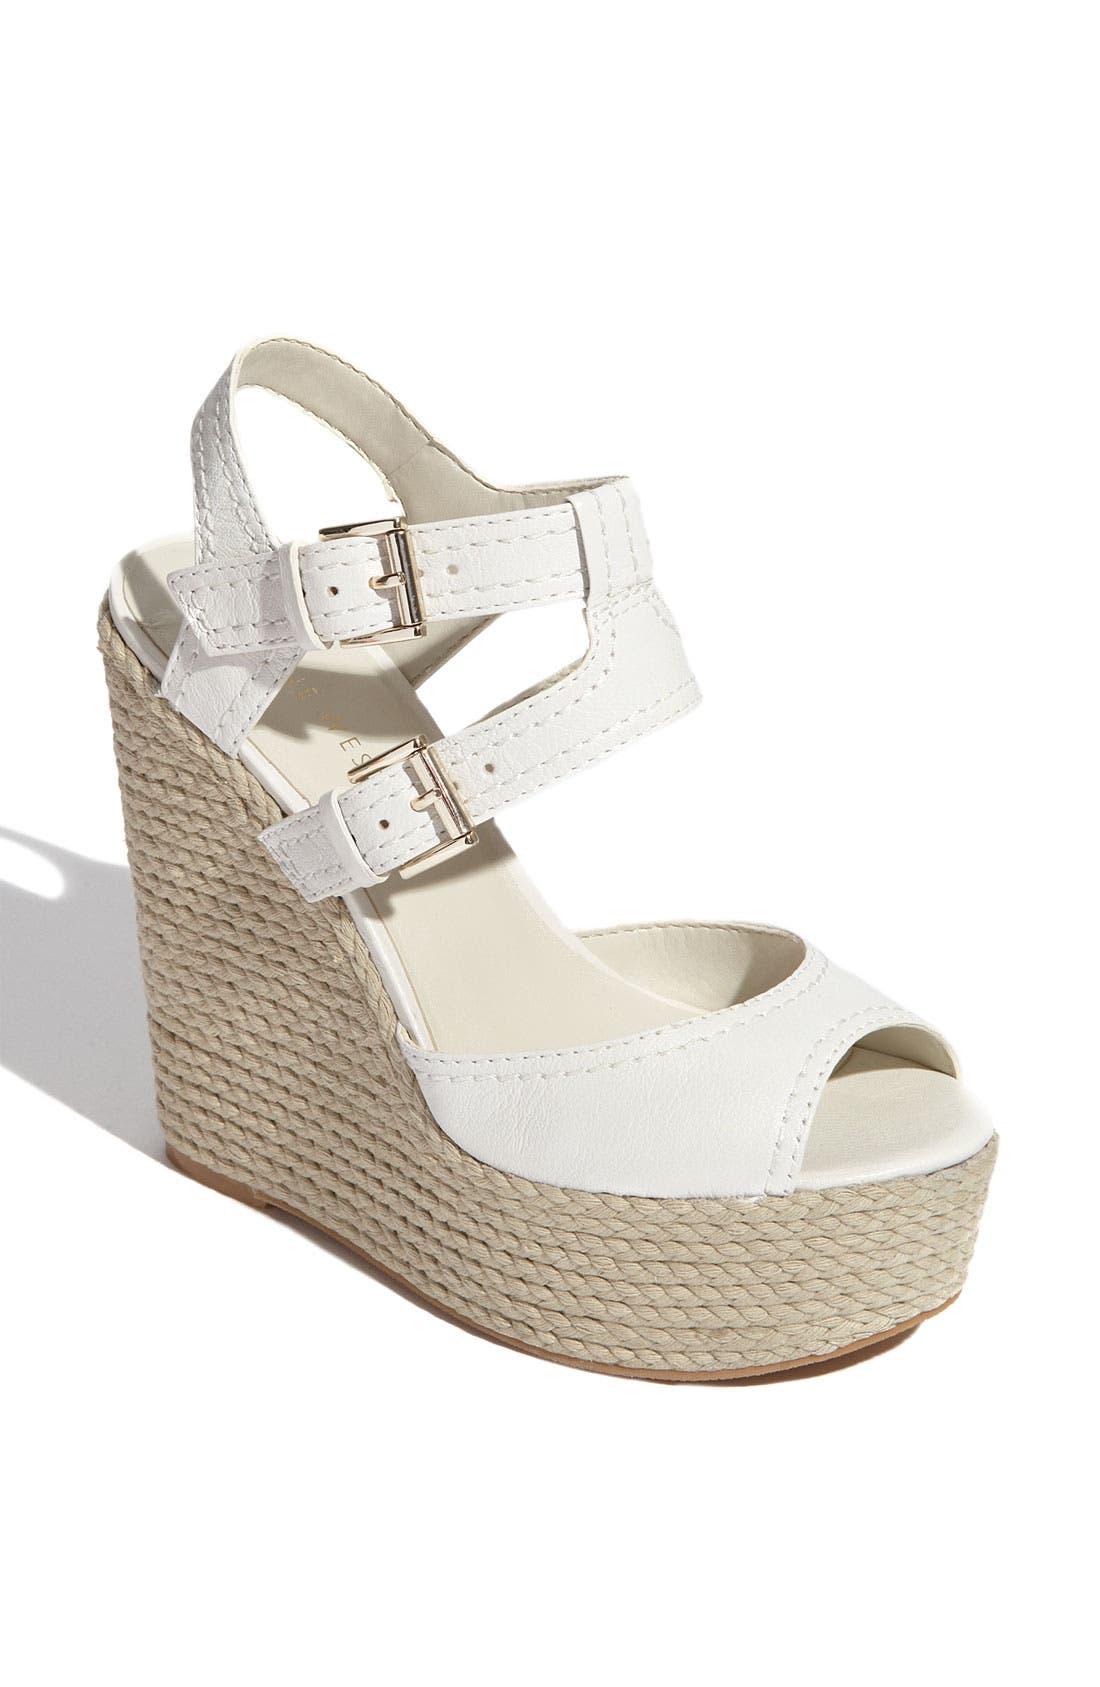 'Blanca' Wedge Sandal, Main, color, 101